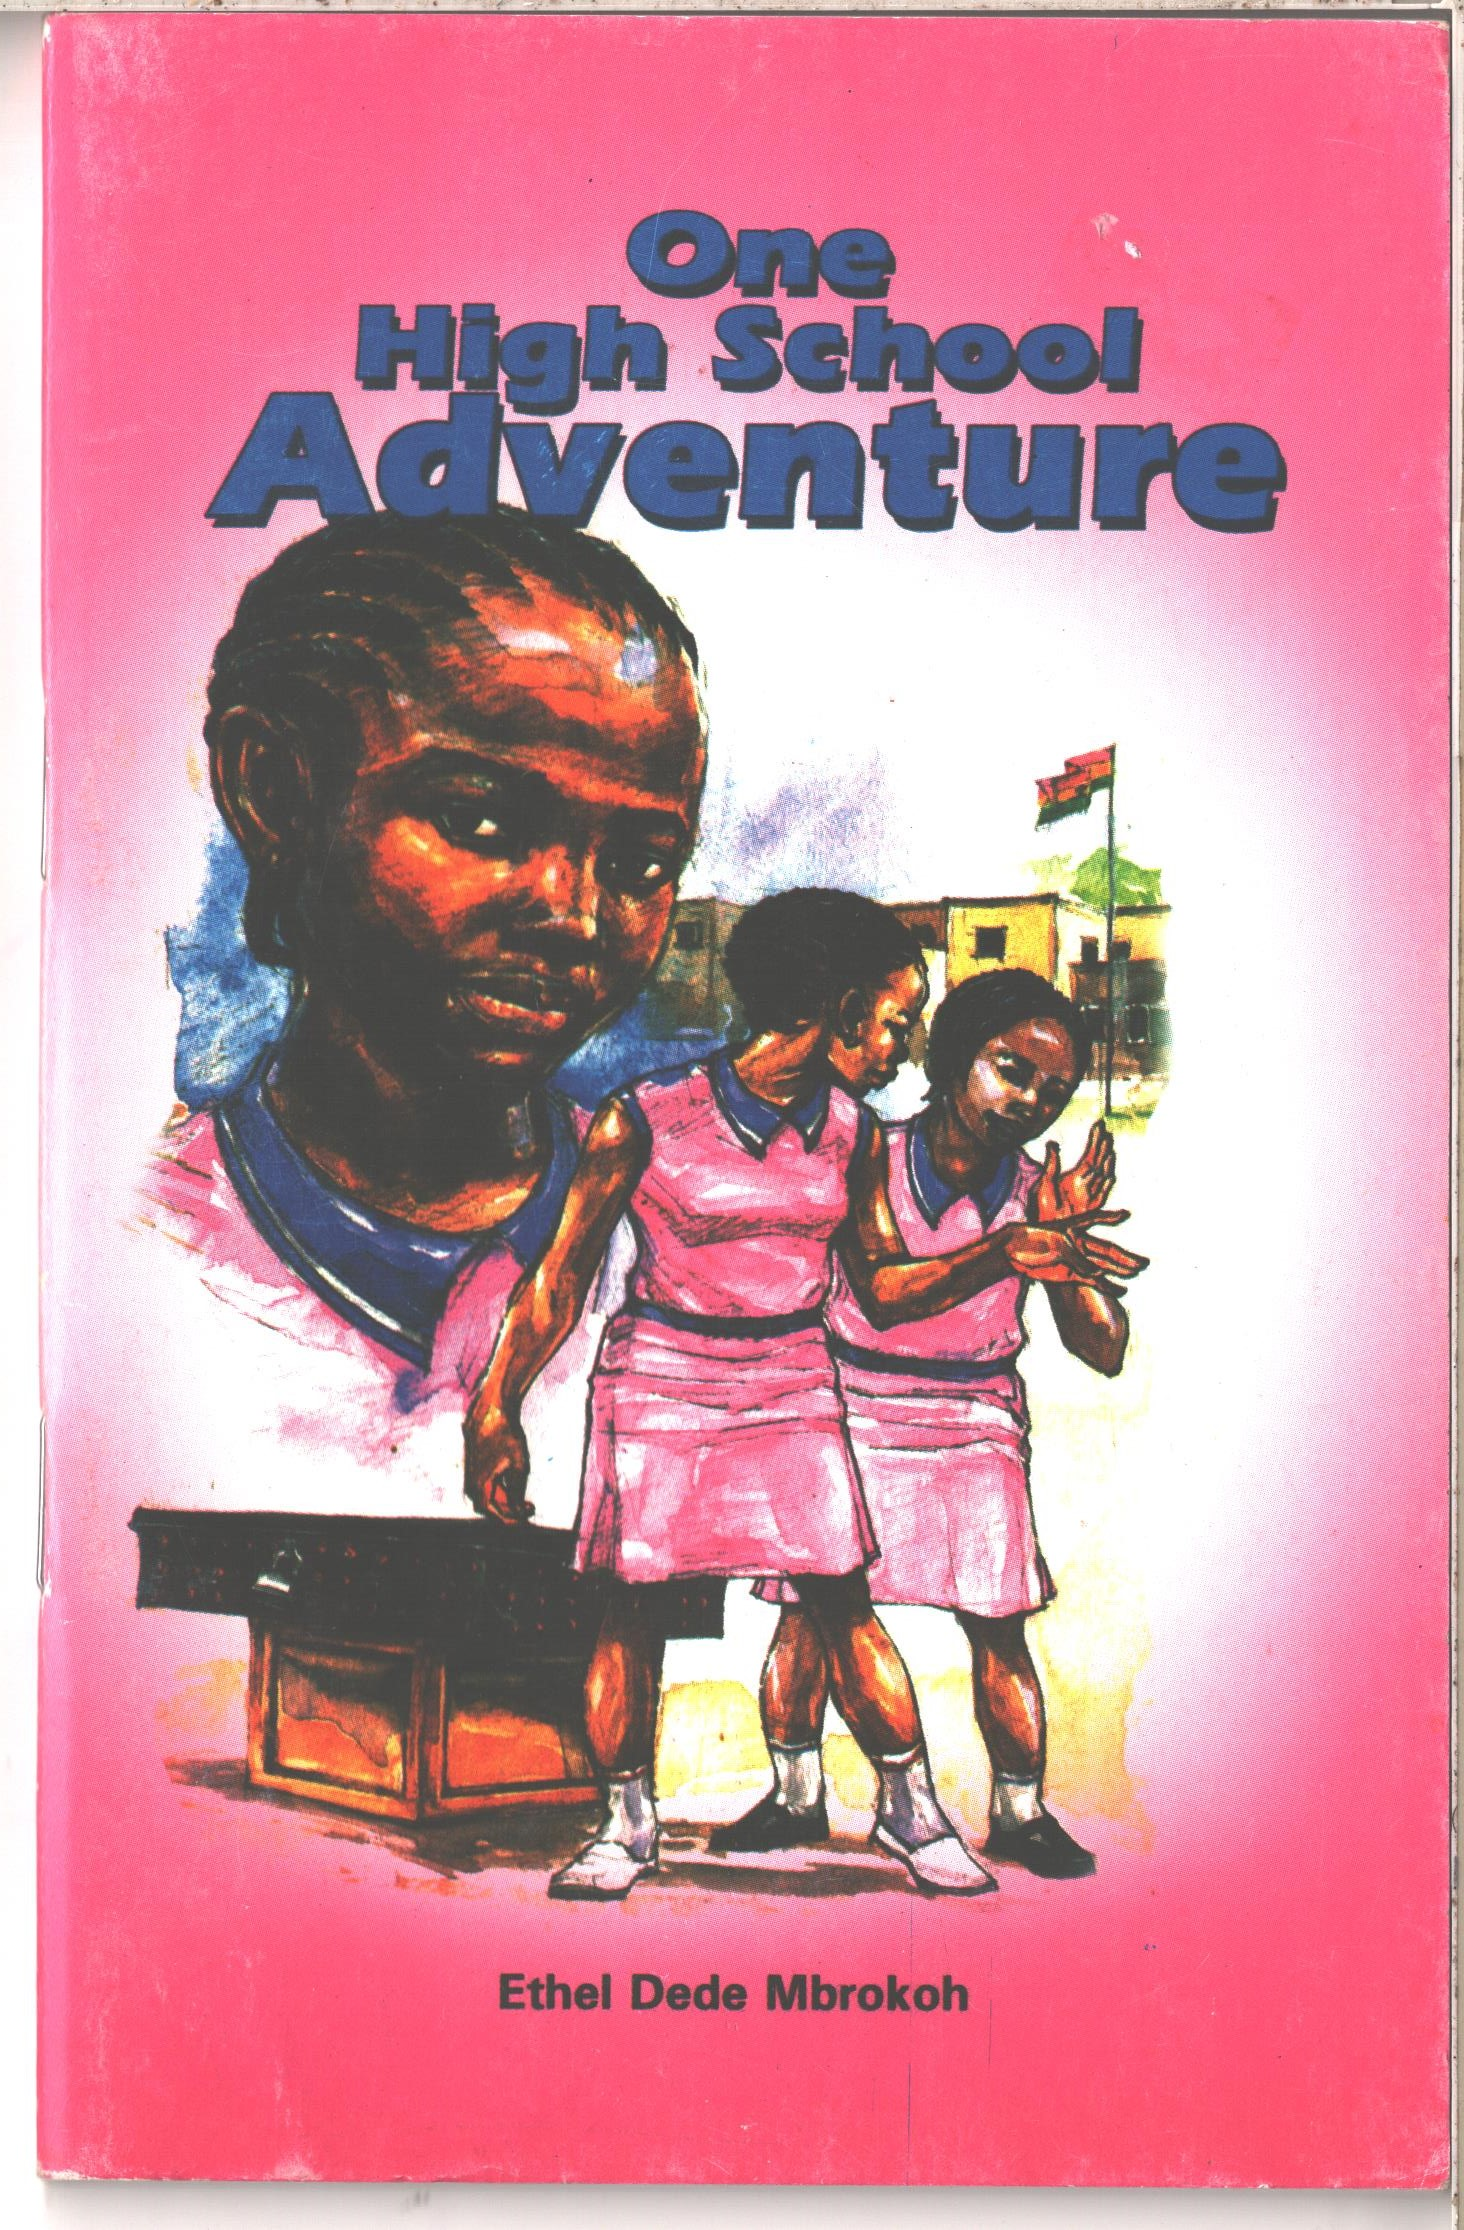 One High School Adventure